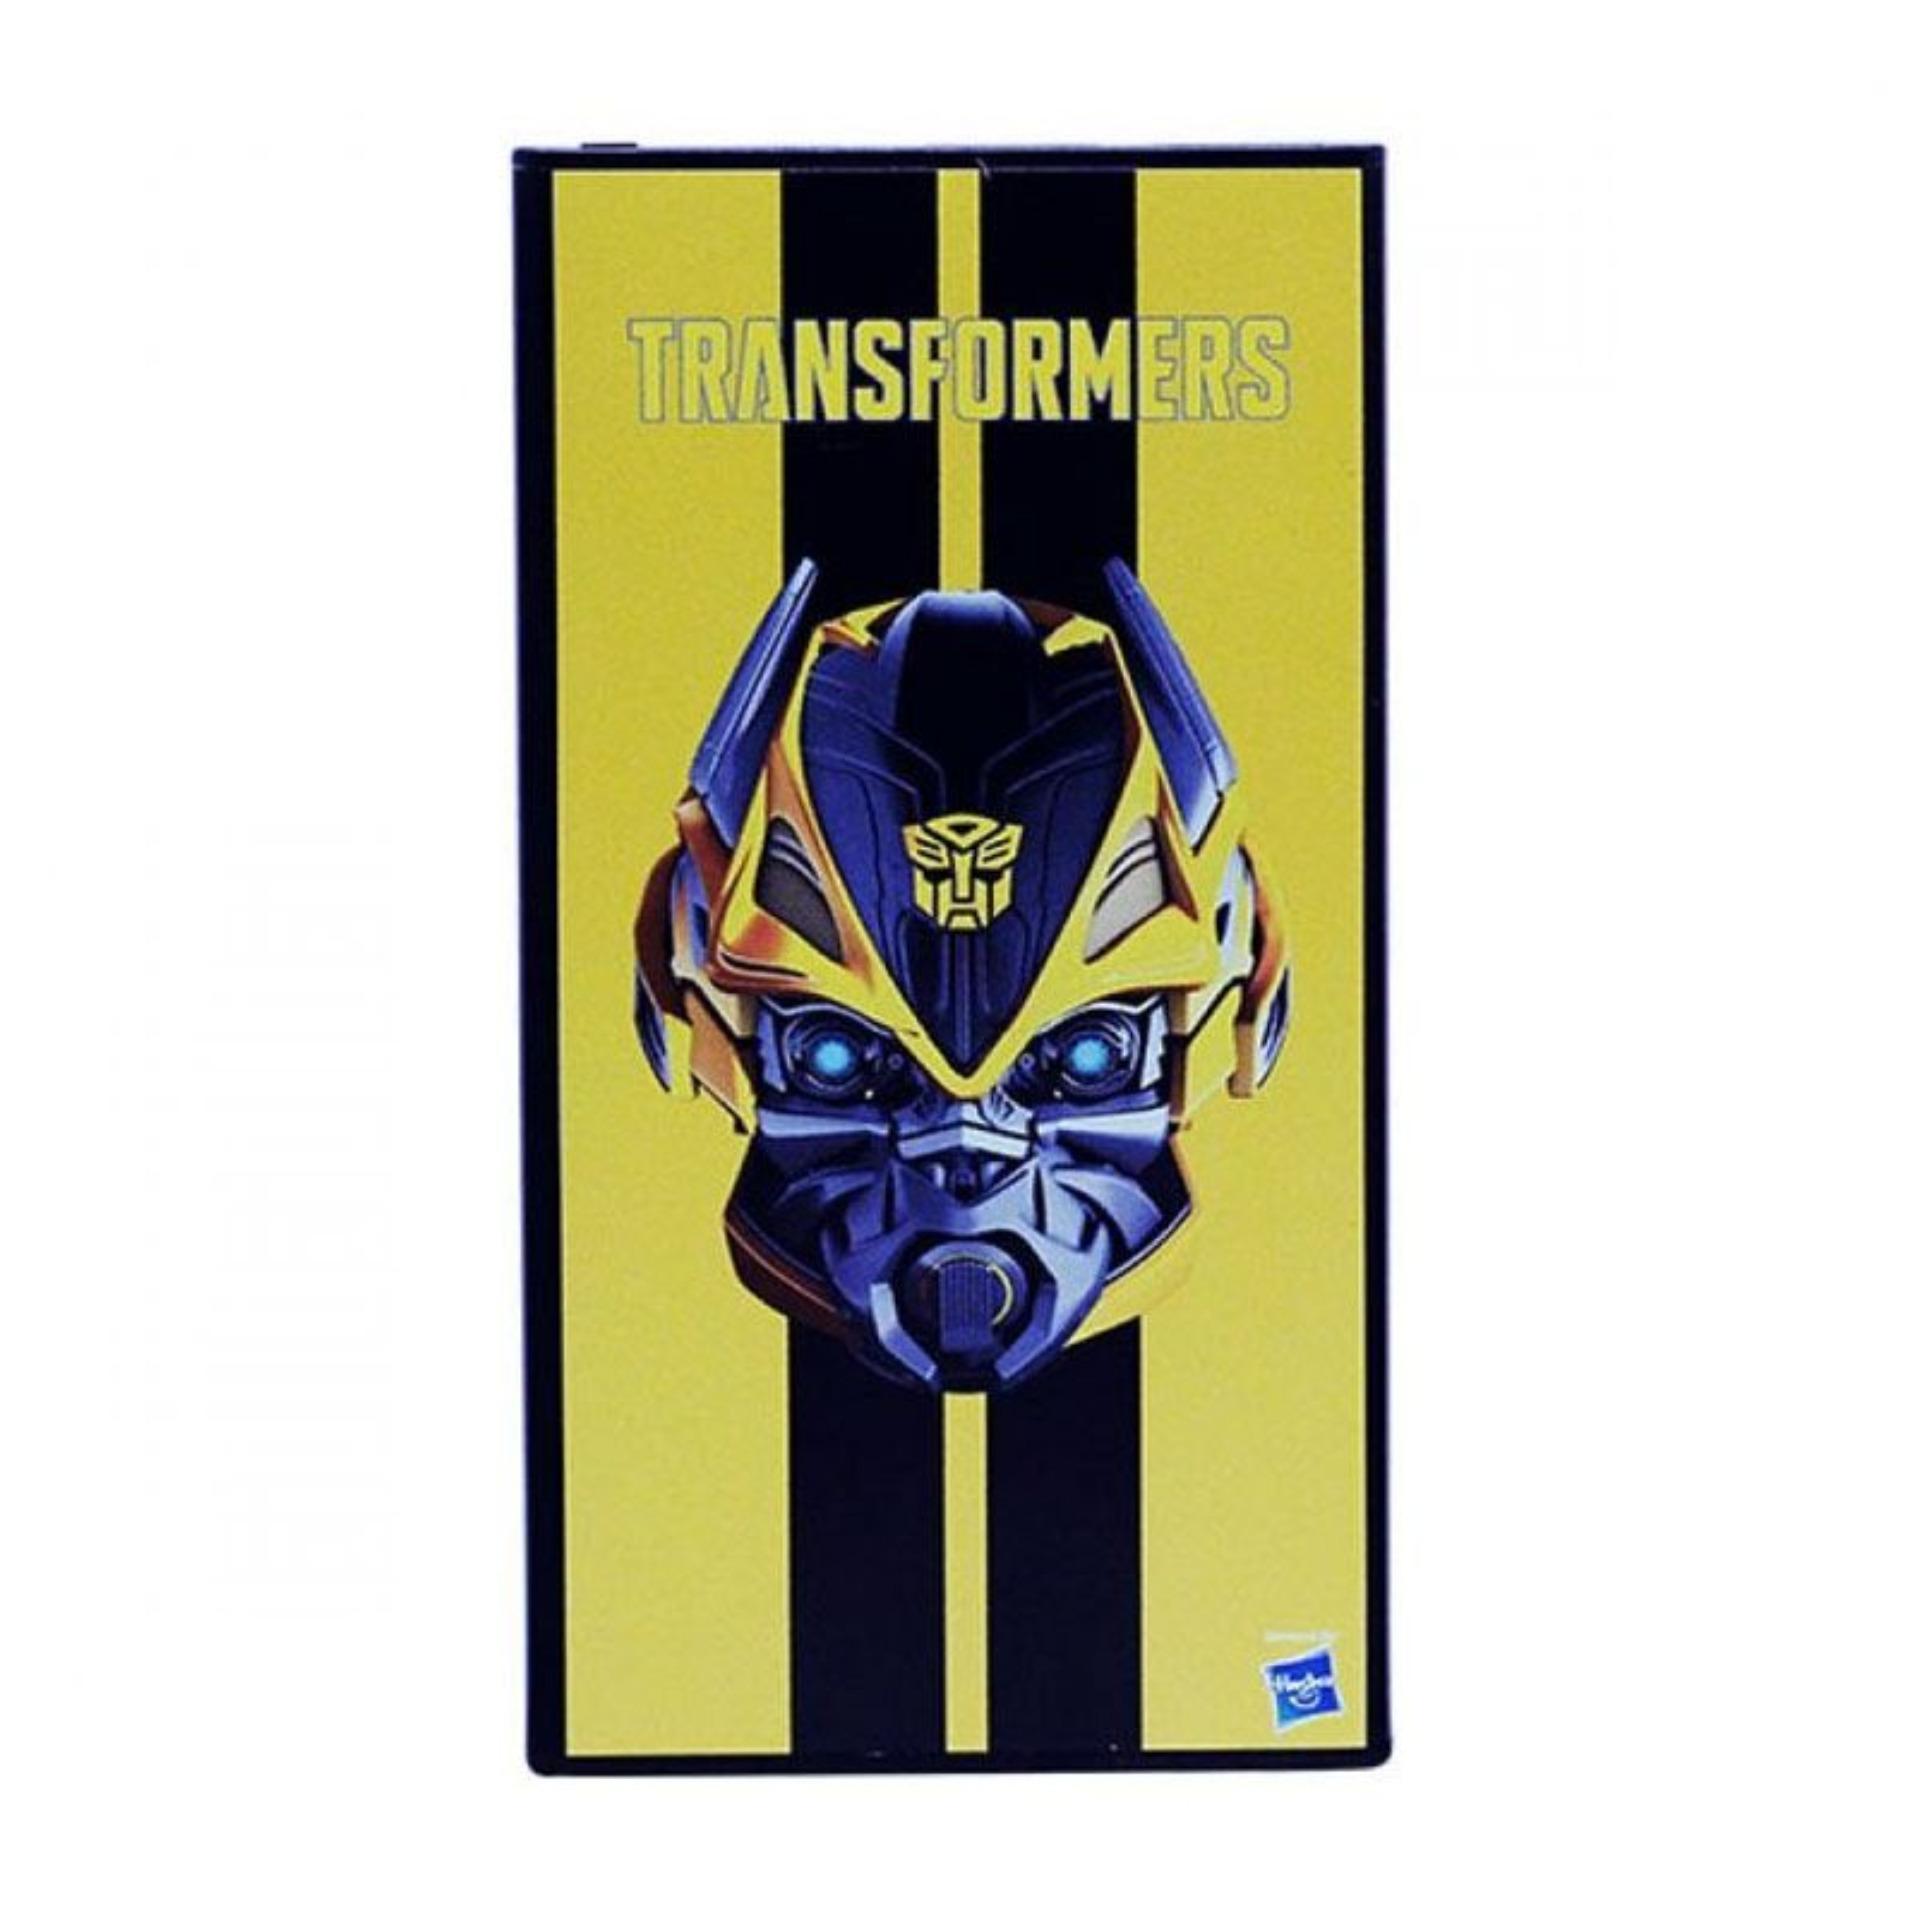 Review Powerbank Mypower Probox 8000Mah Edisi Transformers Probox